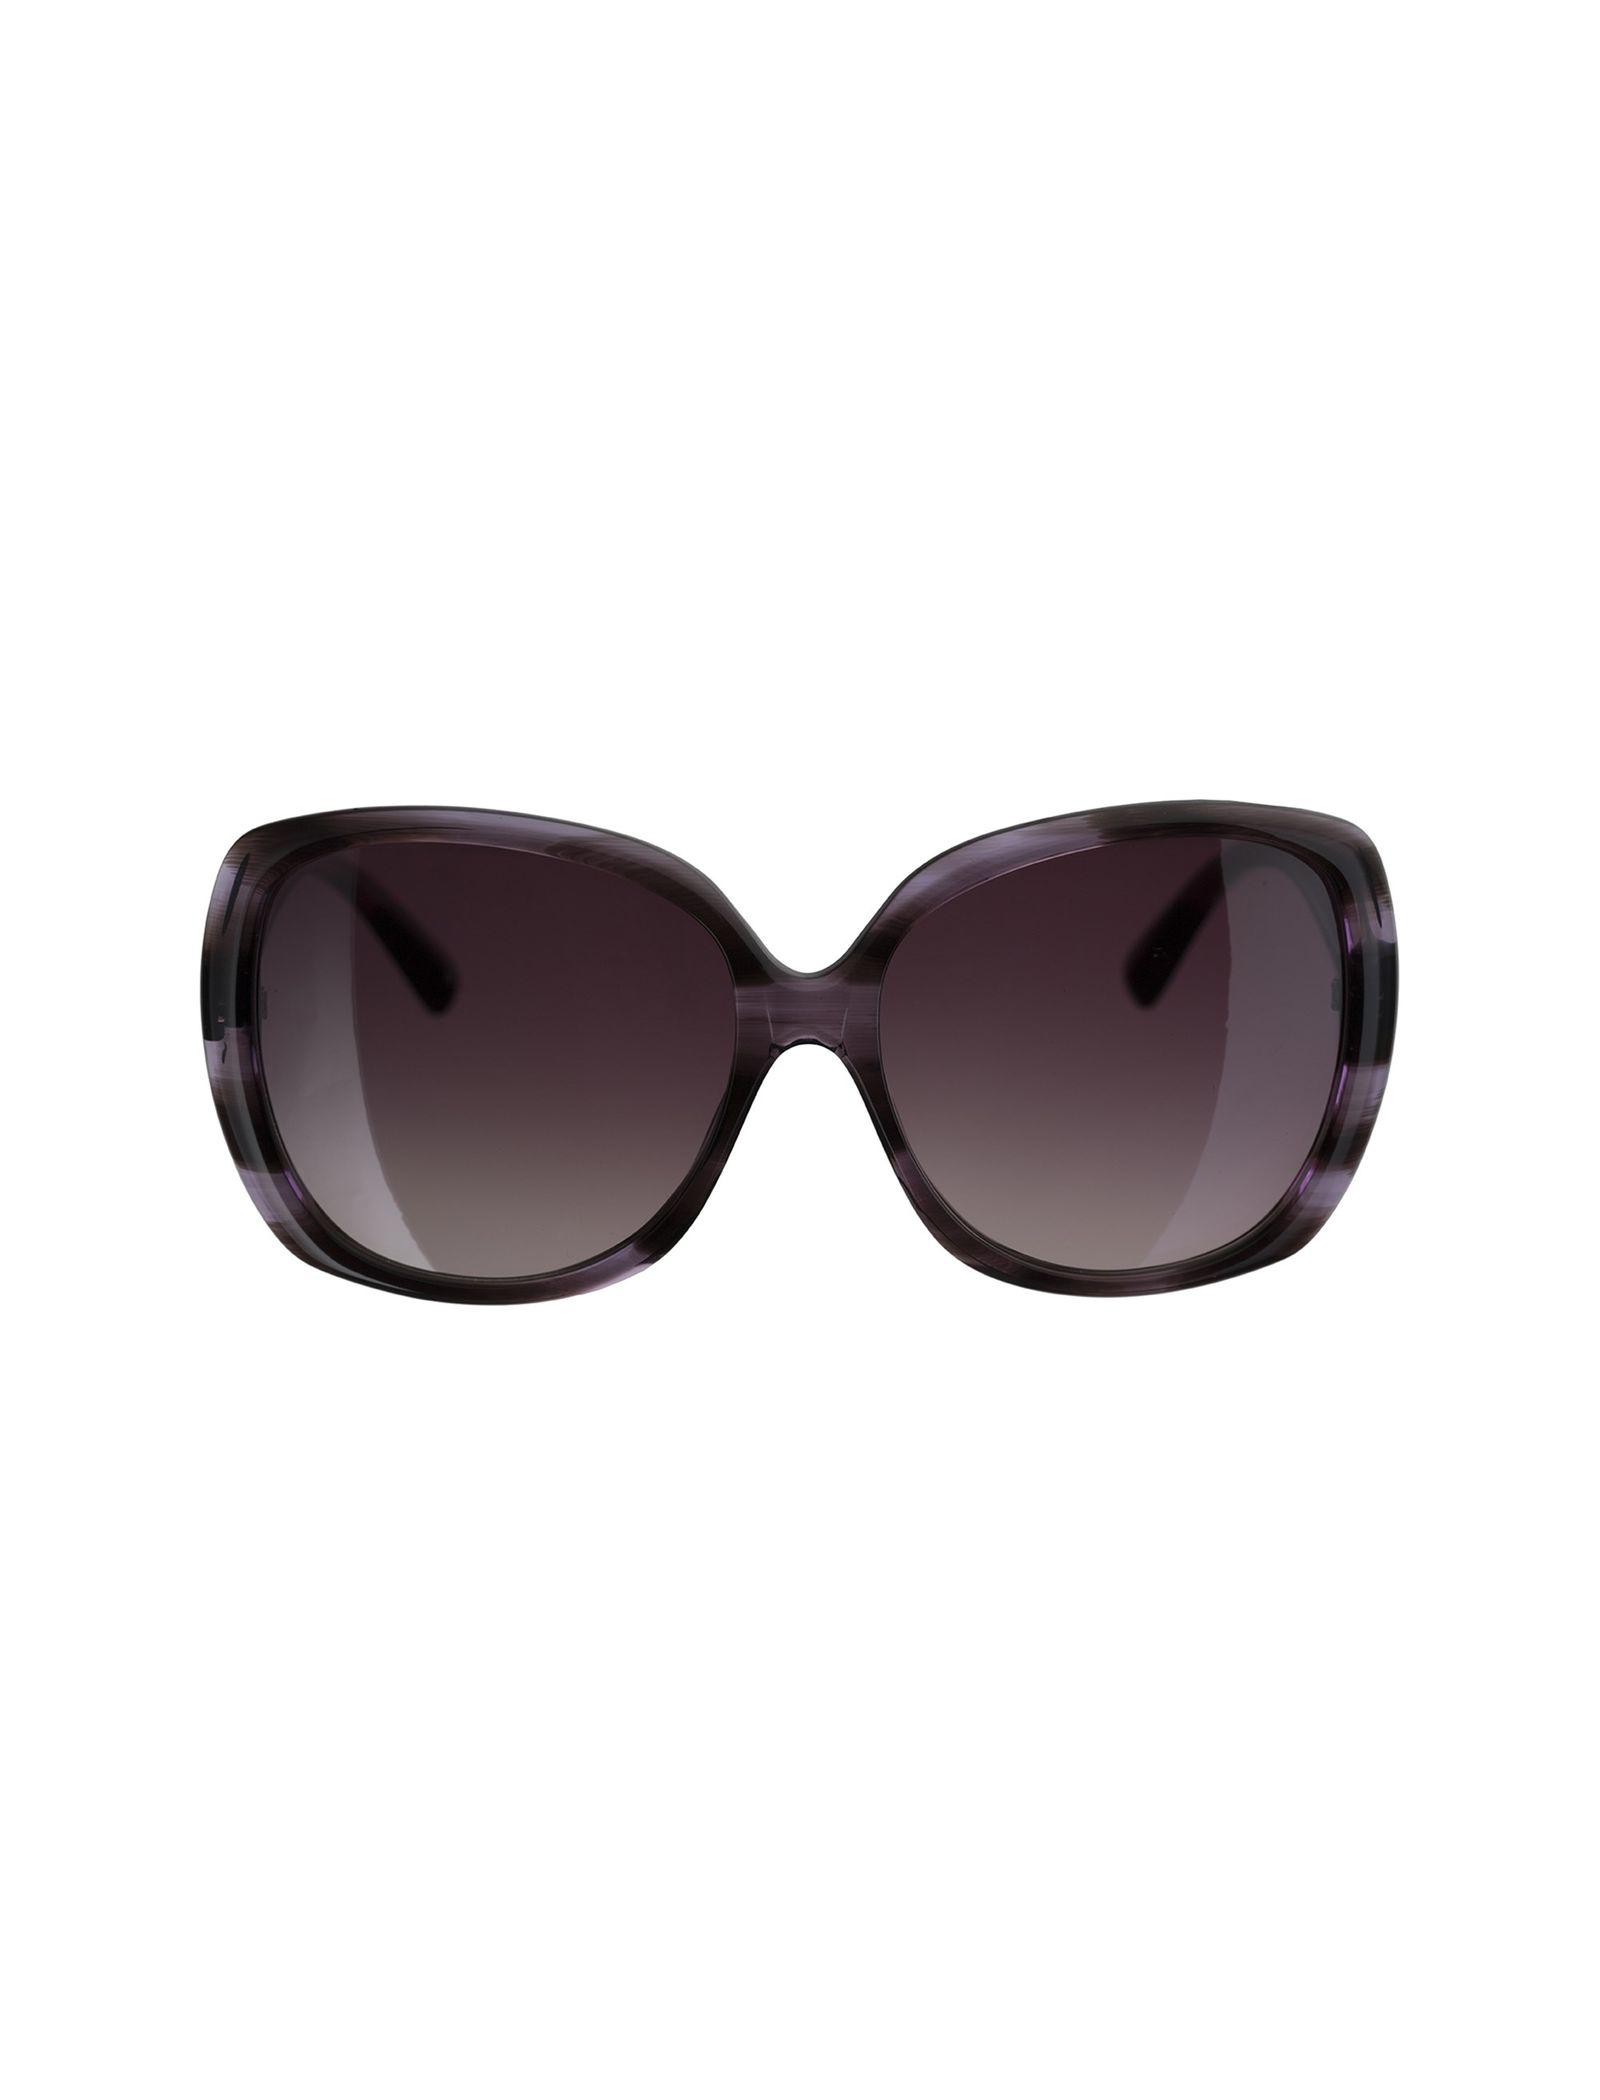 عینک آفتابی مربعی زنانه - ماریم اکو - بنفش   - 1